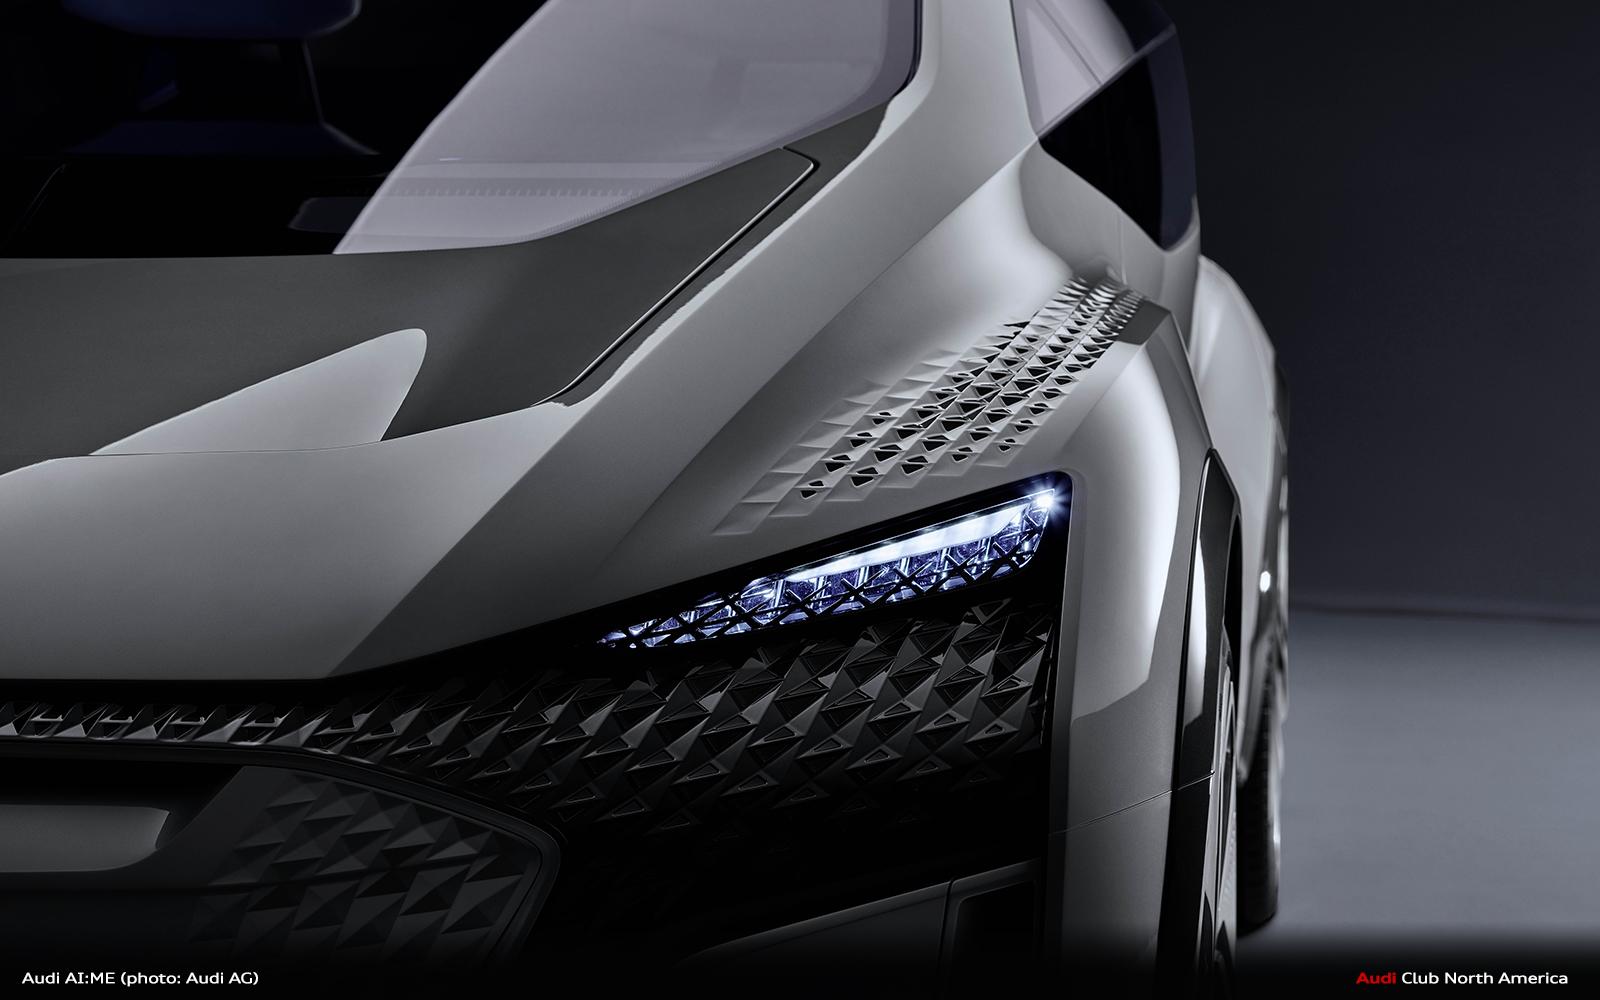 Mobility for Megacities: Audi AI:ME